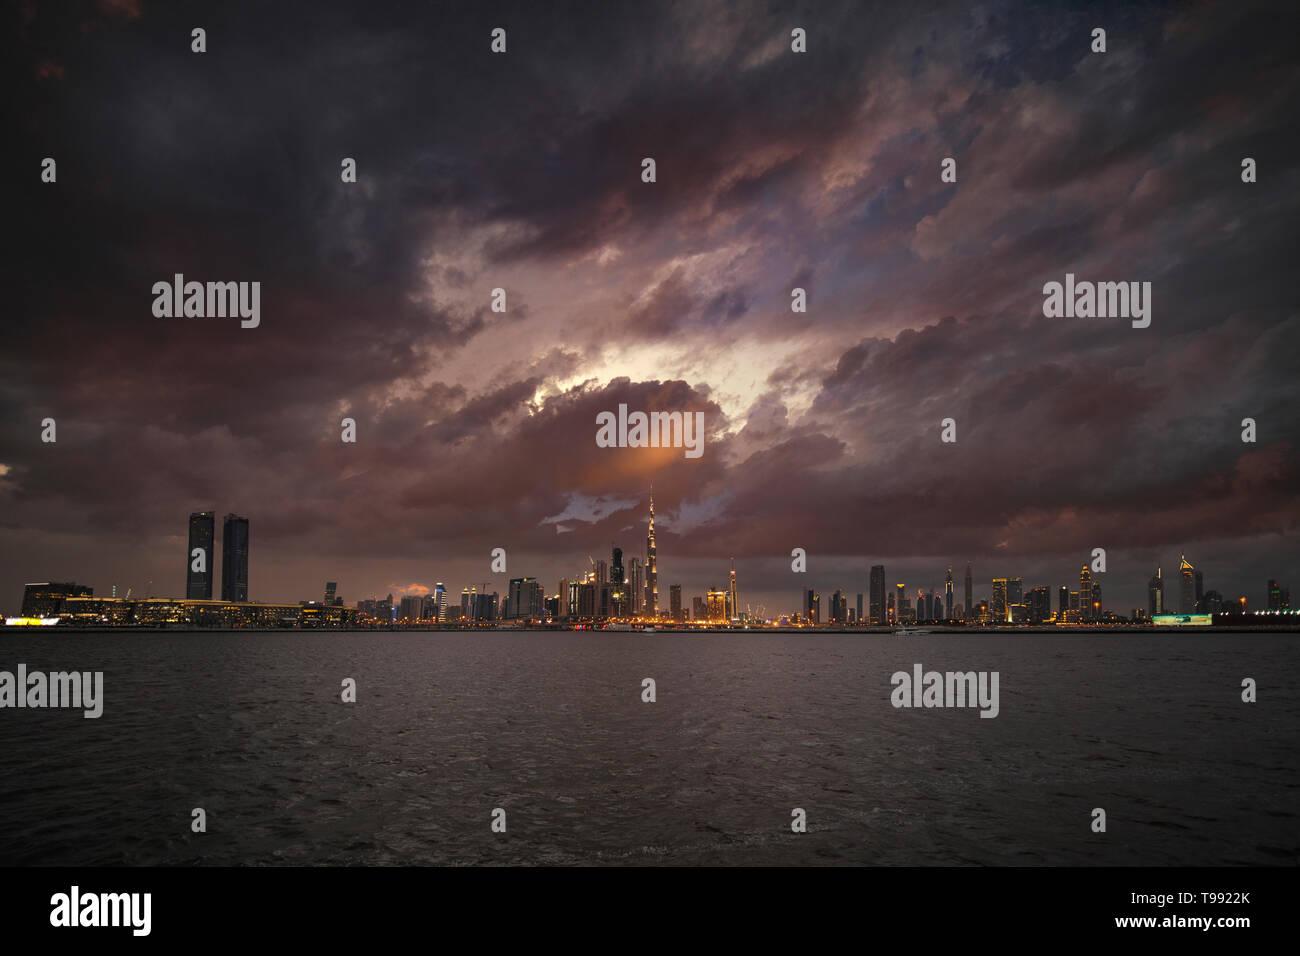 Cloudy sunset with Dubai Skyline - Stock Image